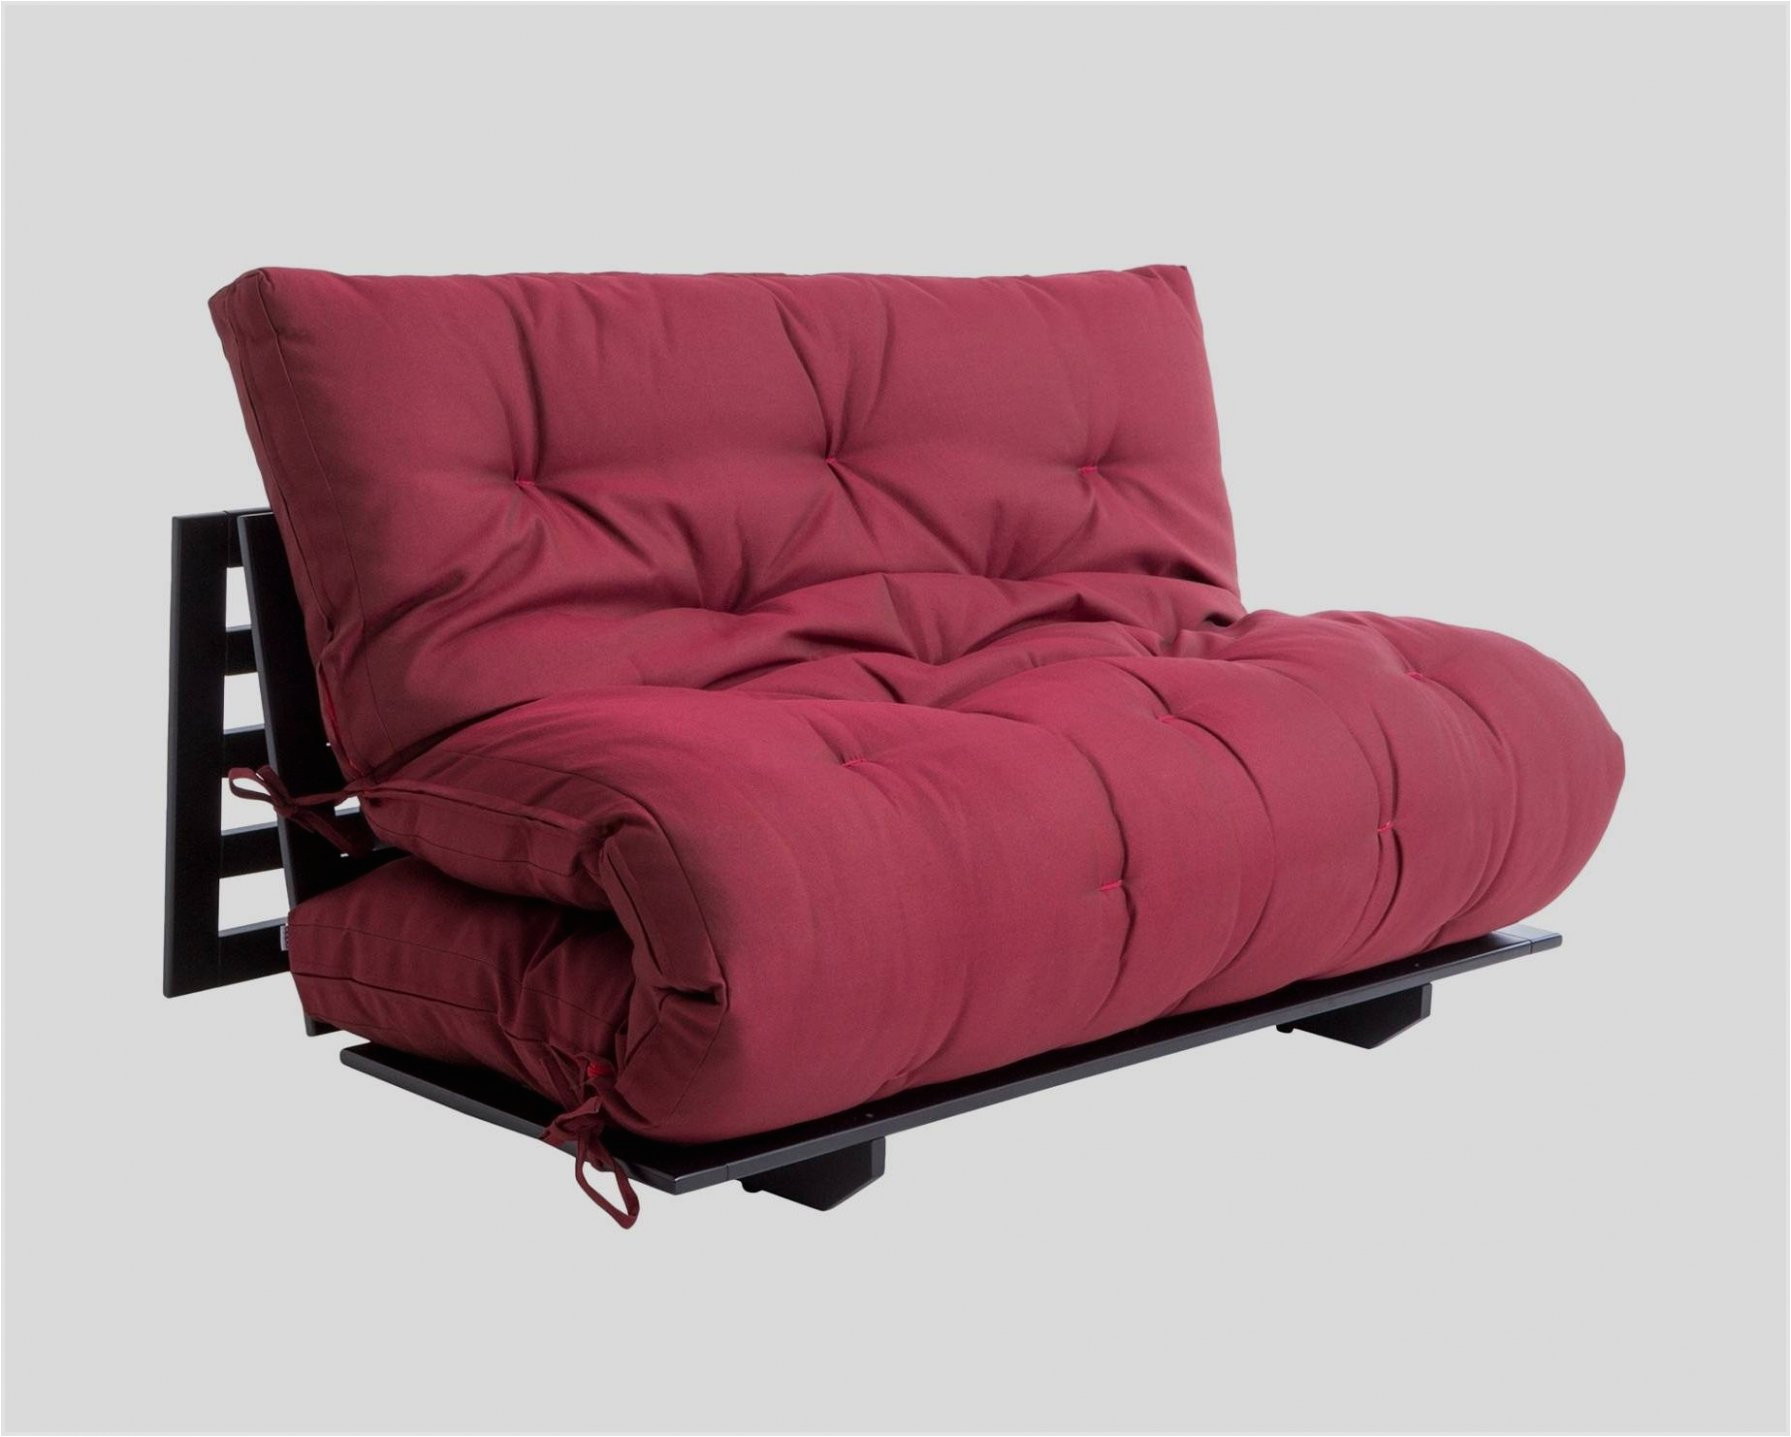 Ikea Hermoso Mano Sofa Polipiel Segunda B6gy7yf Tenerife Cama 25 WE2ID9H